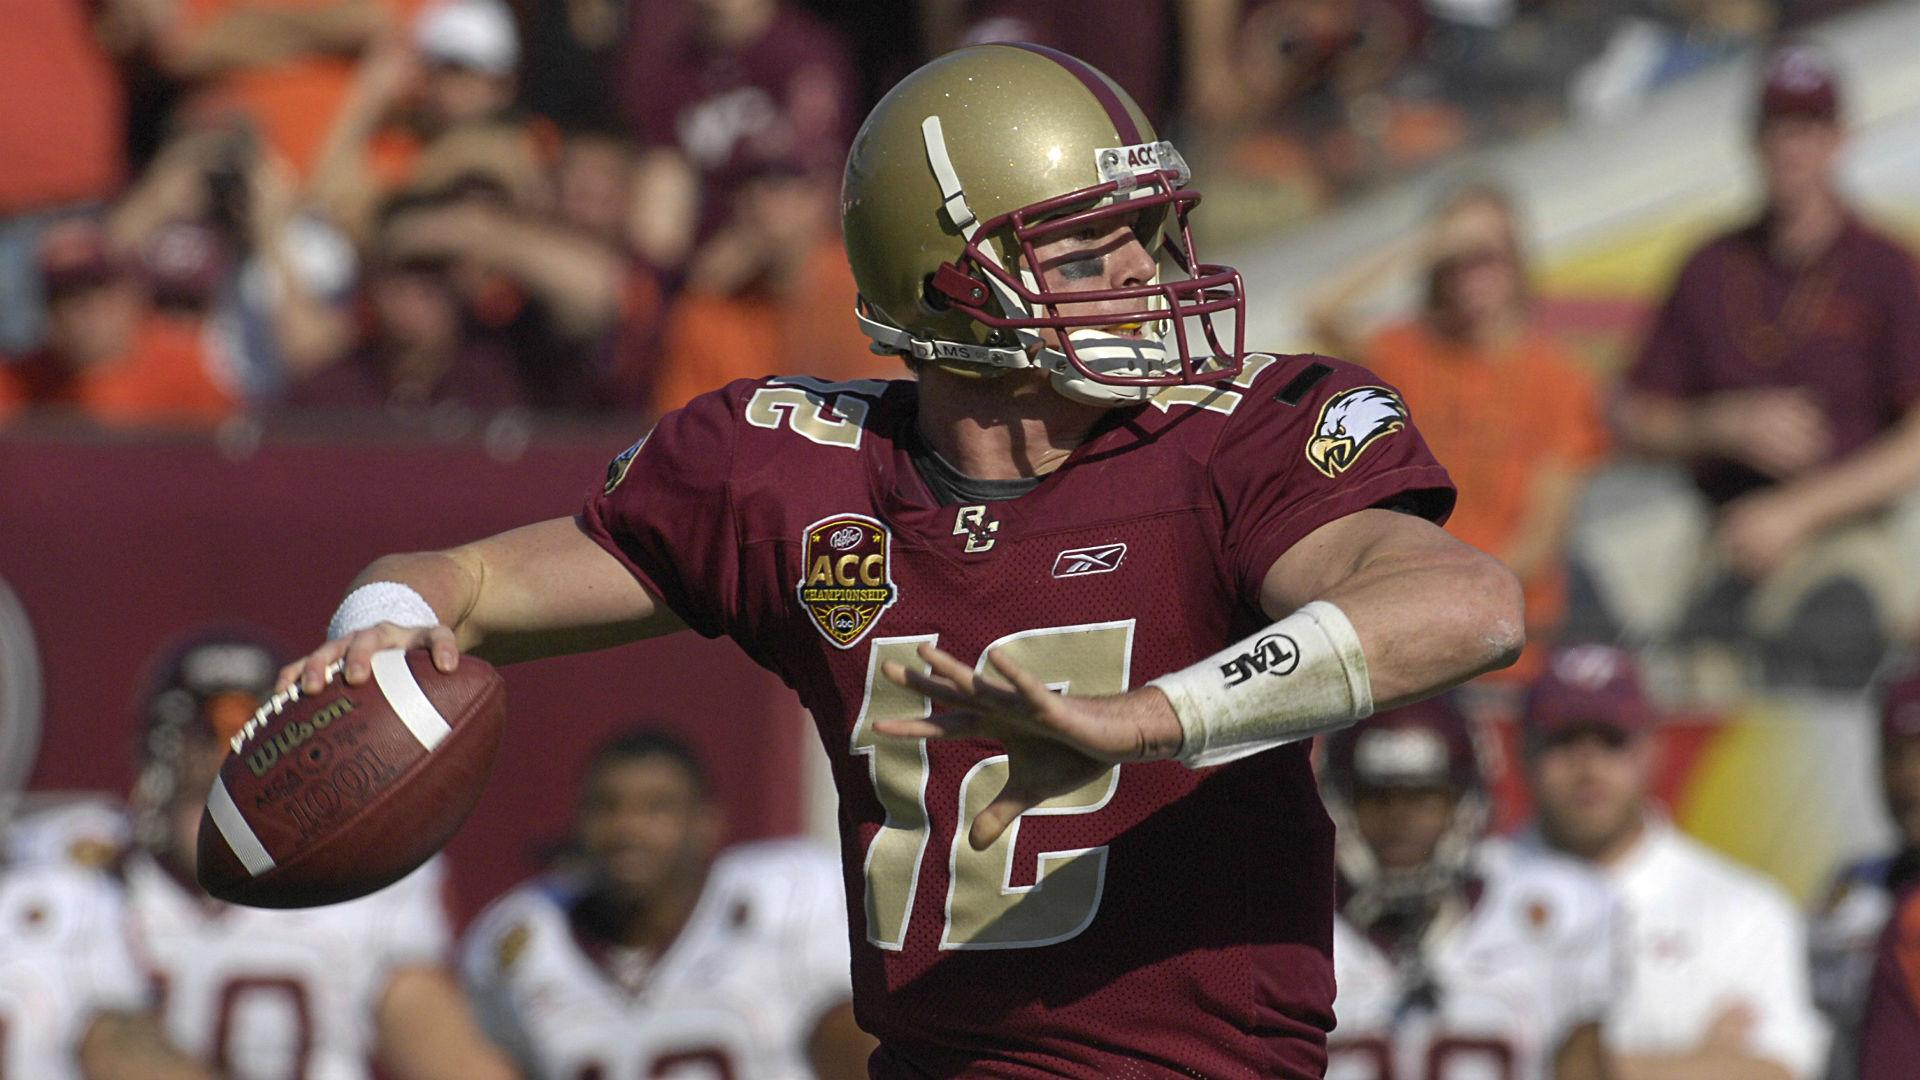 Boston College will retire QB Matt Ryan's jersey Saturday